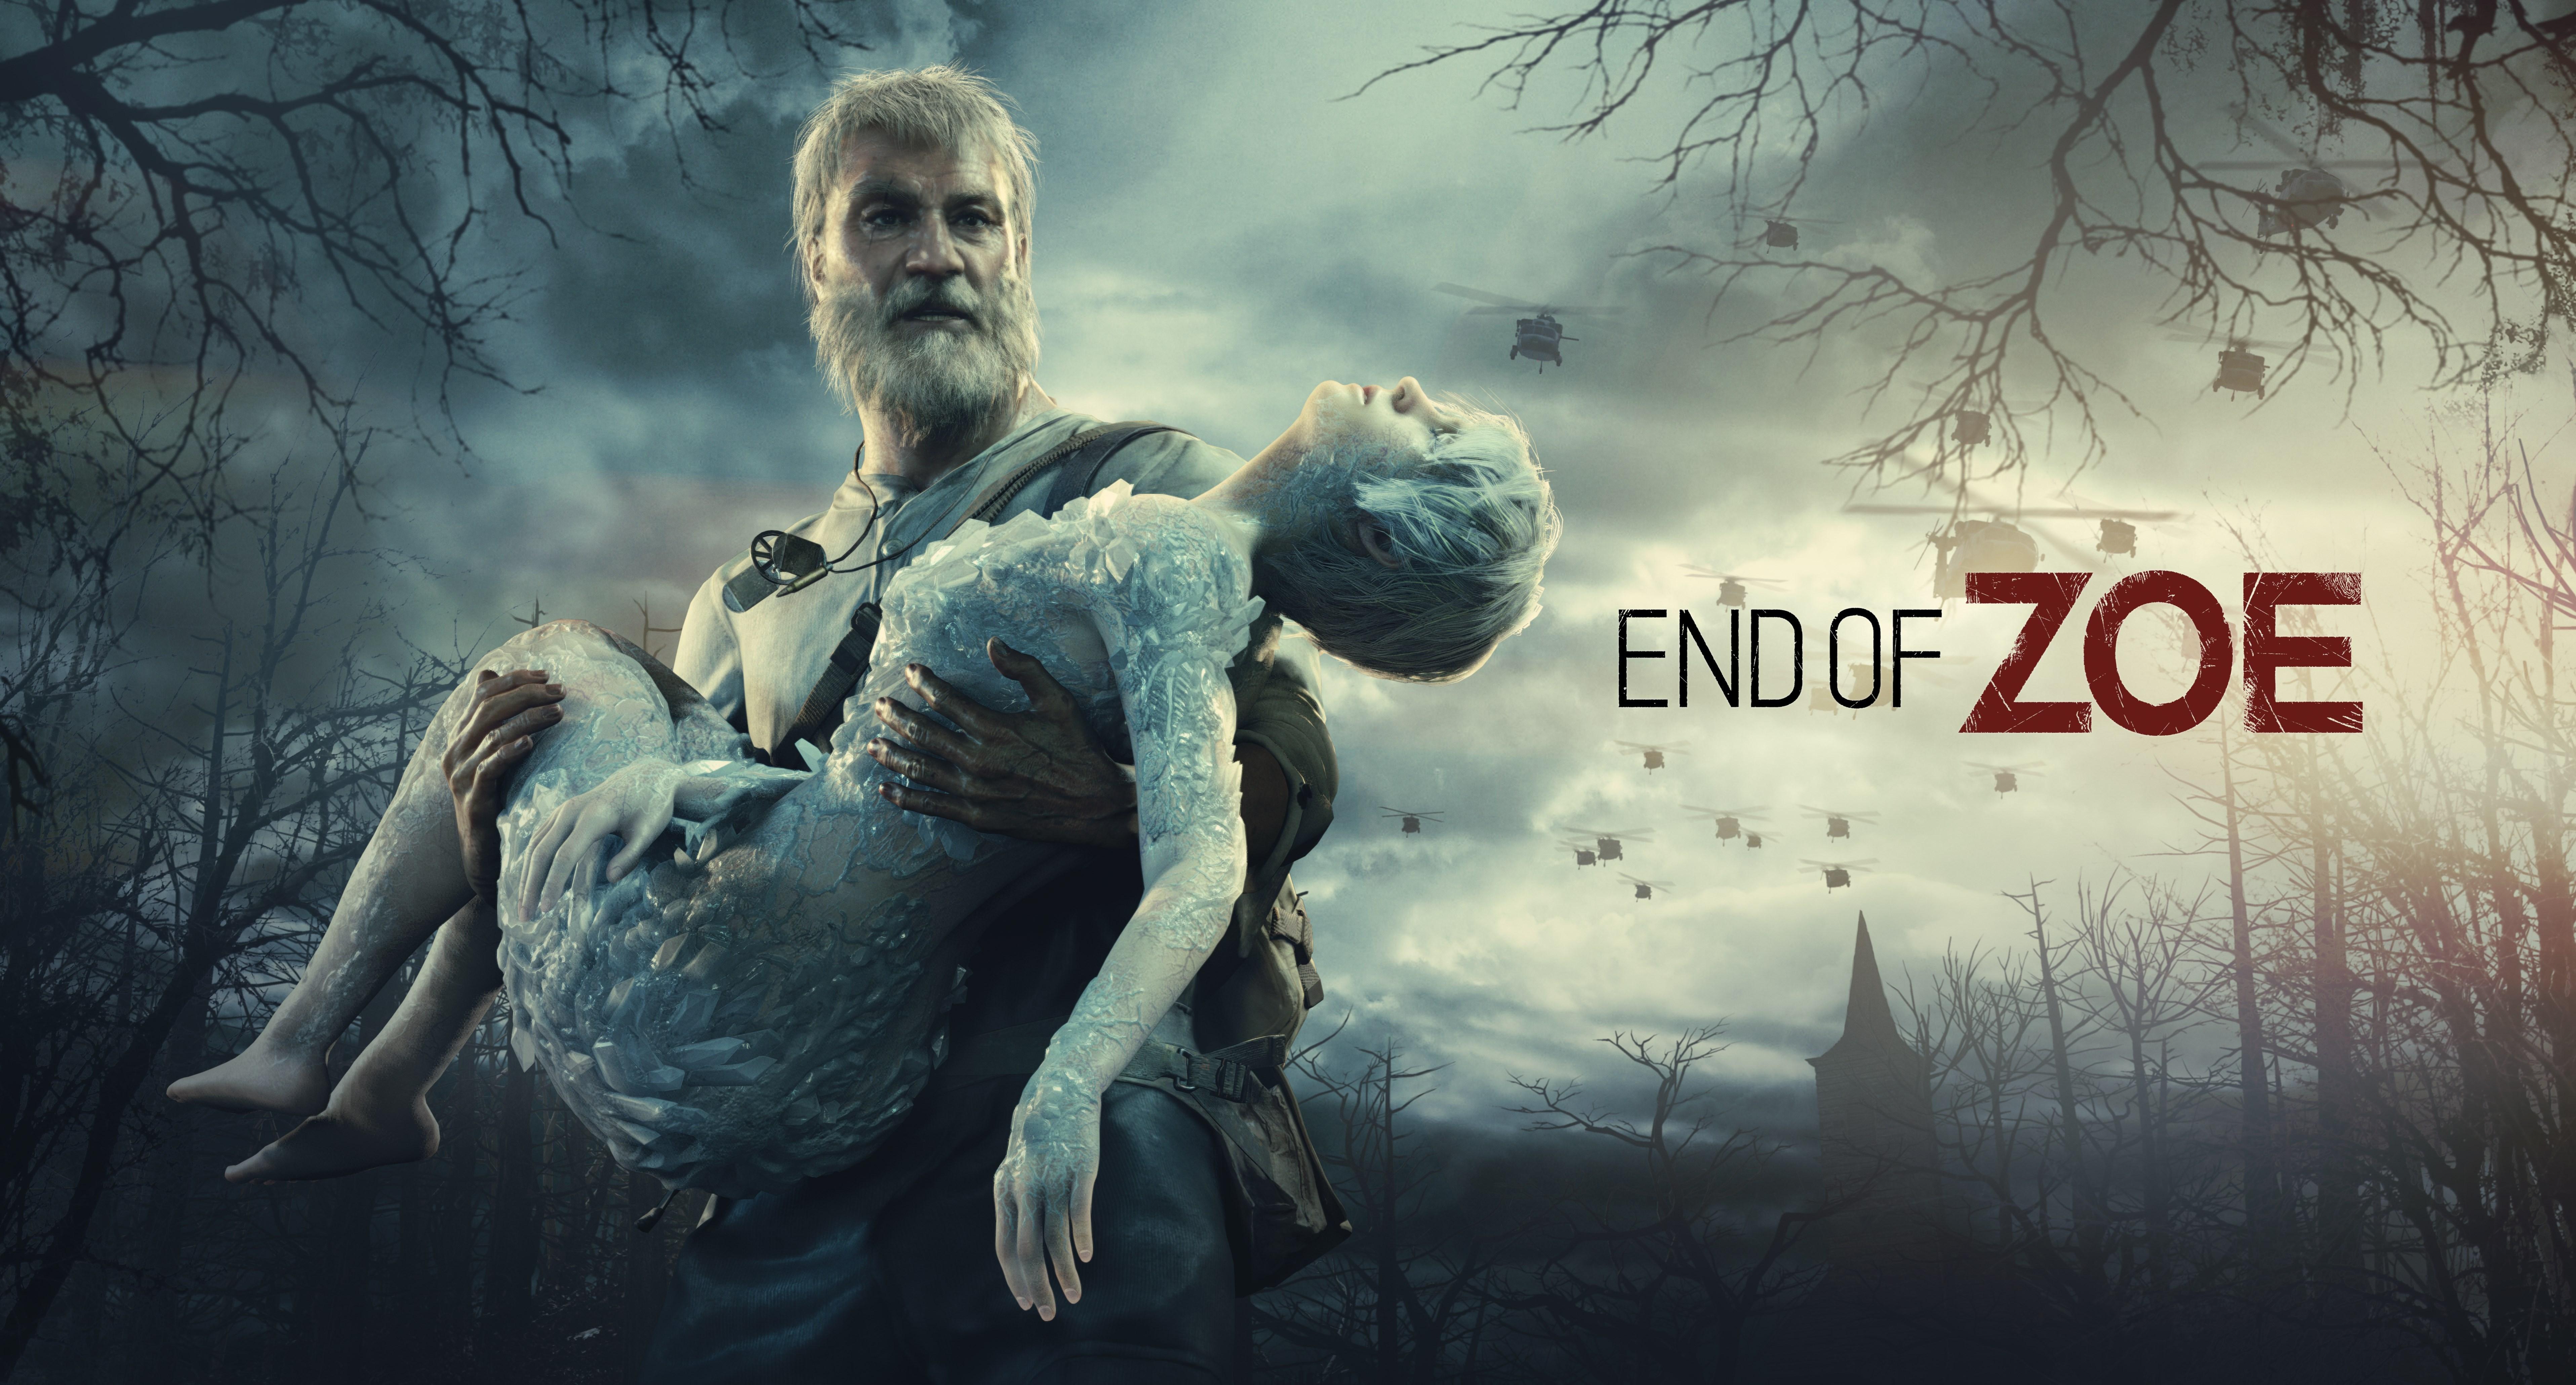 1920x1200 Resident Evil 7 Biohazard End Of Zoe 8k 1080p Resolution